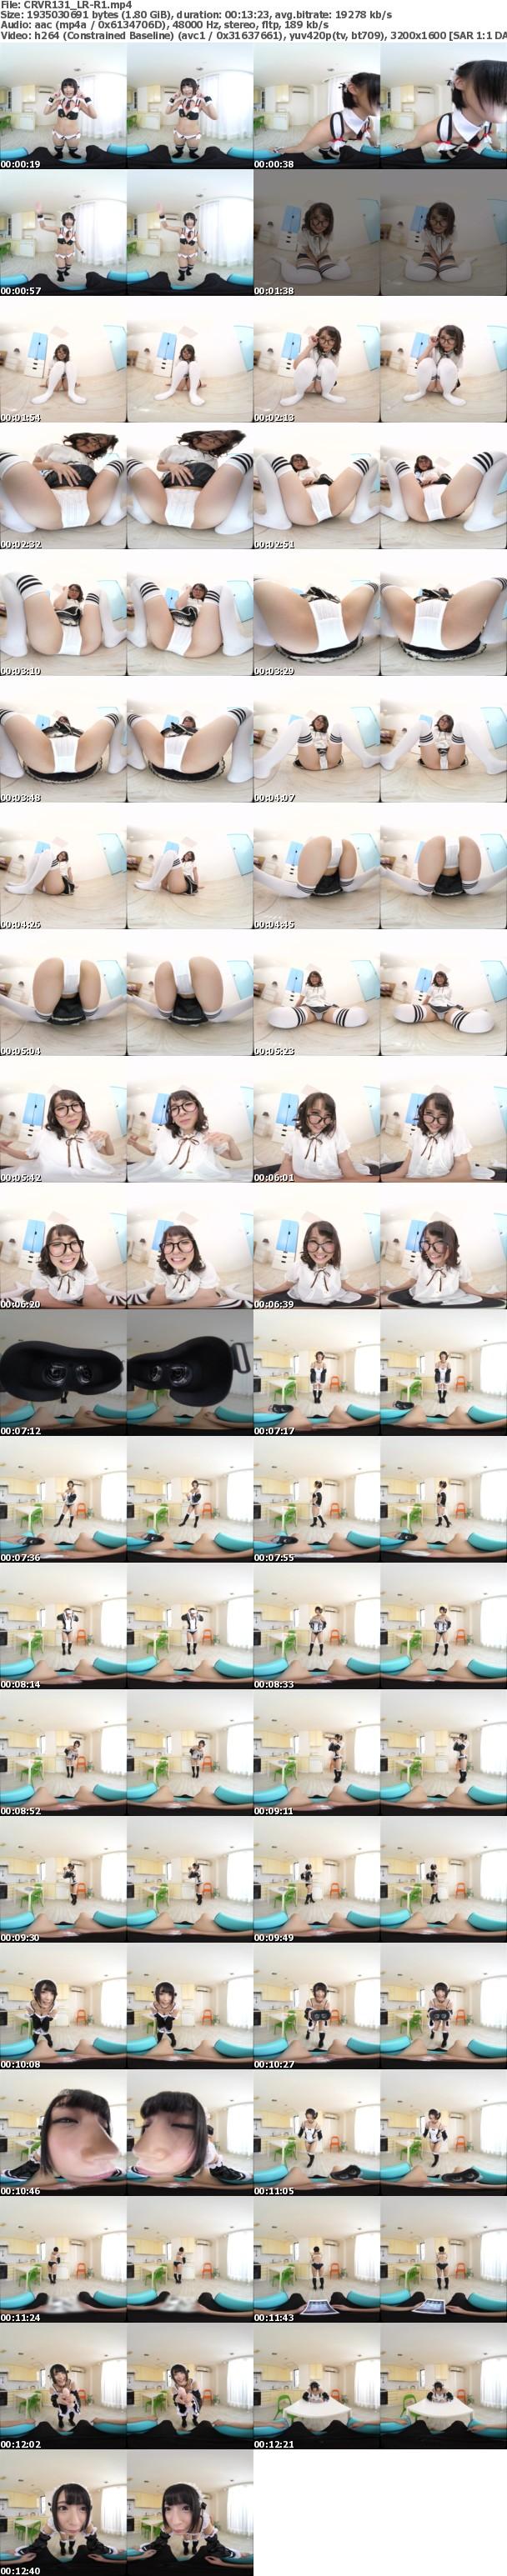 VR/3D CRVR-131 【匠】阿部乃みく 続・ボクのことを好き過ぎるご奉仕メイドとのなんともうらやましい日常。